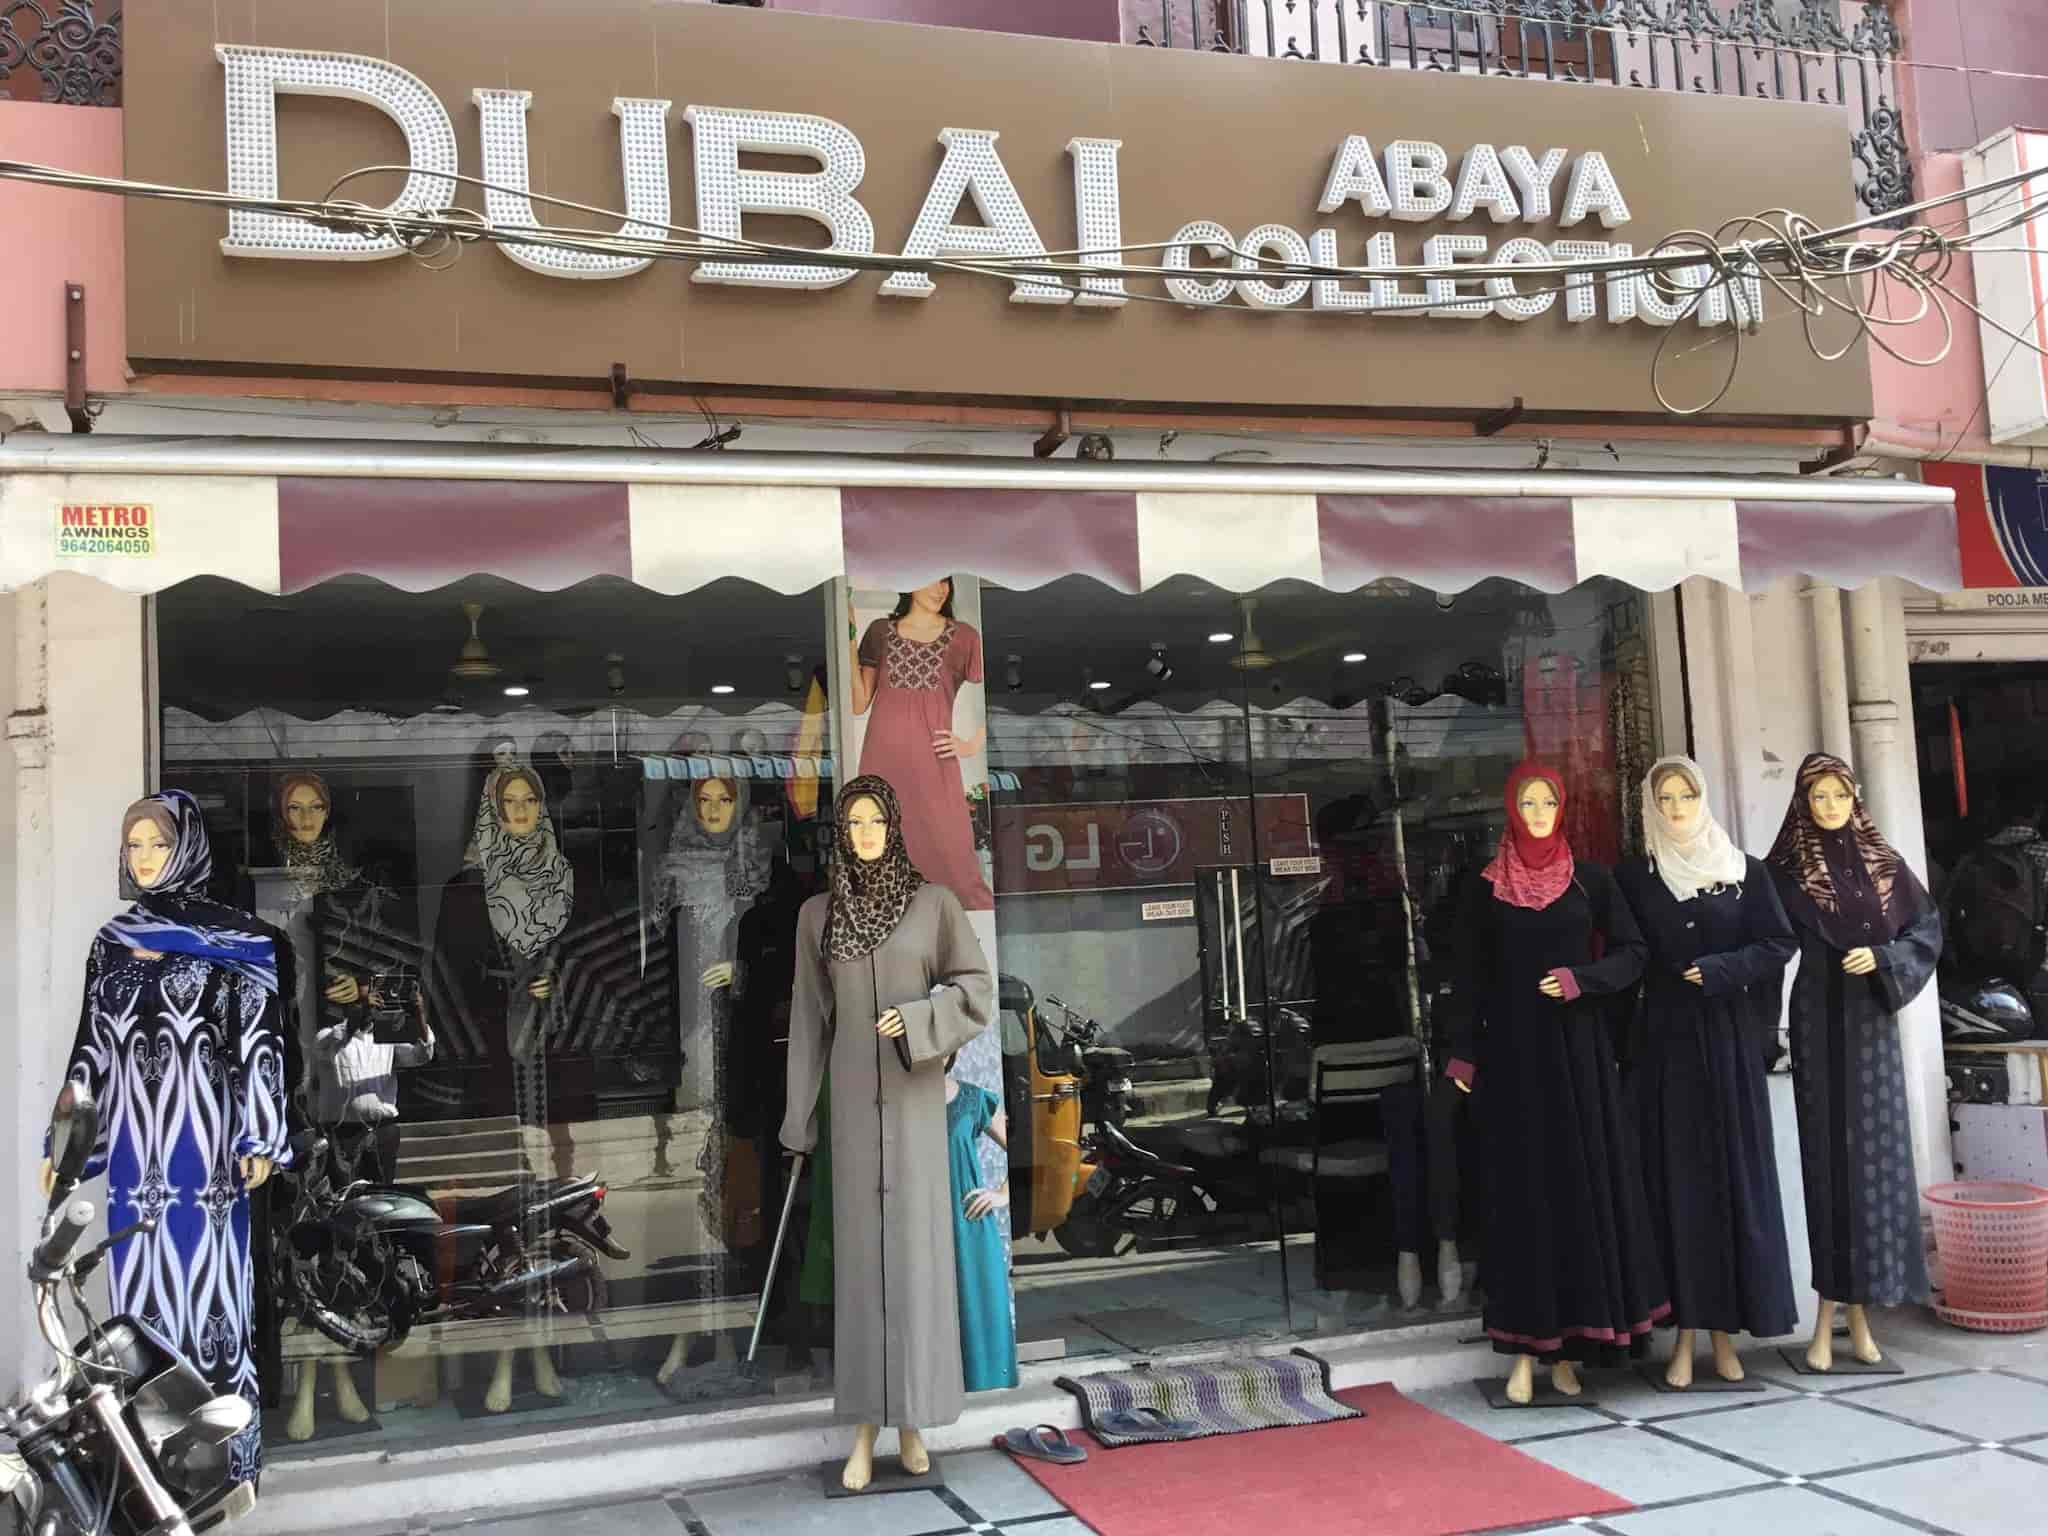 Dubai Abaya Collection Mehdipatnam Burkha Retailers In Hyderabad